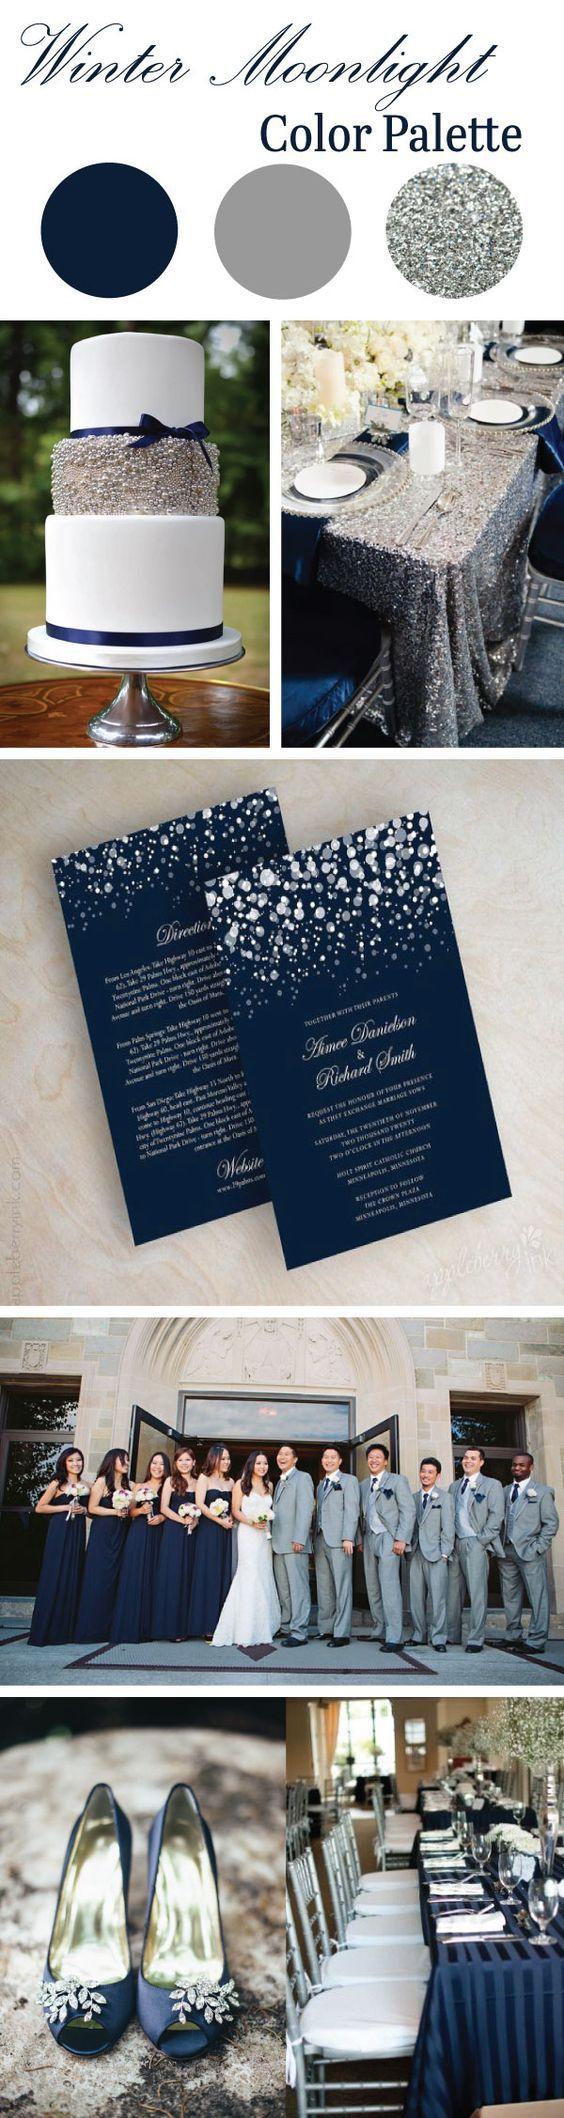 Winter Moonlight Wedding Color Palette | LinenTablecloth Blog #colorpalette # wedding #events: